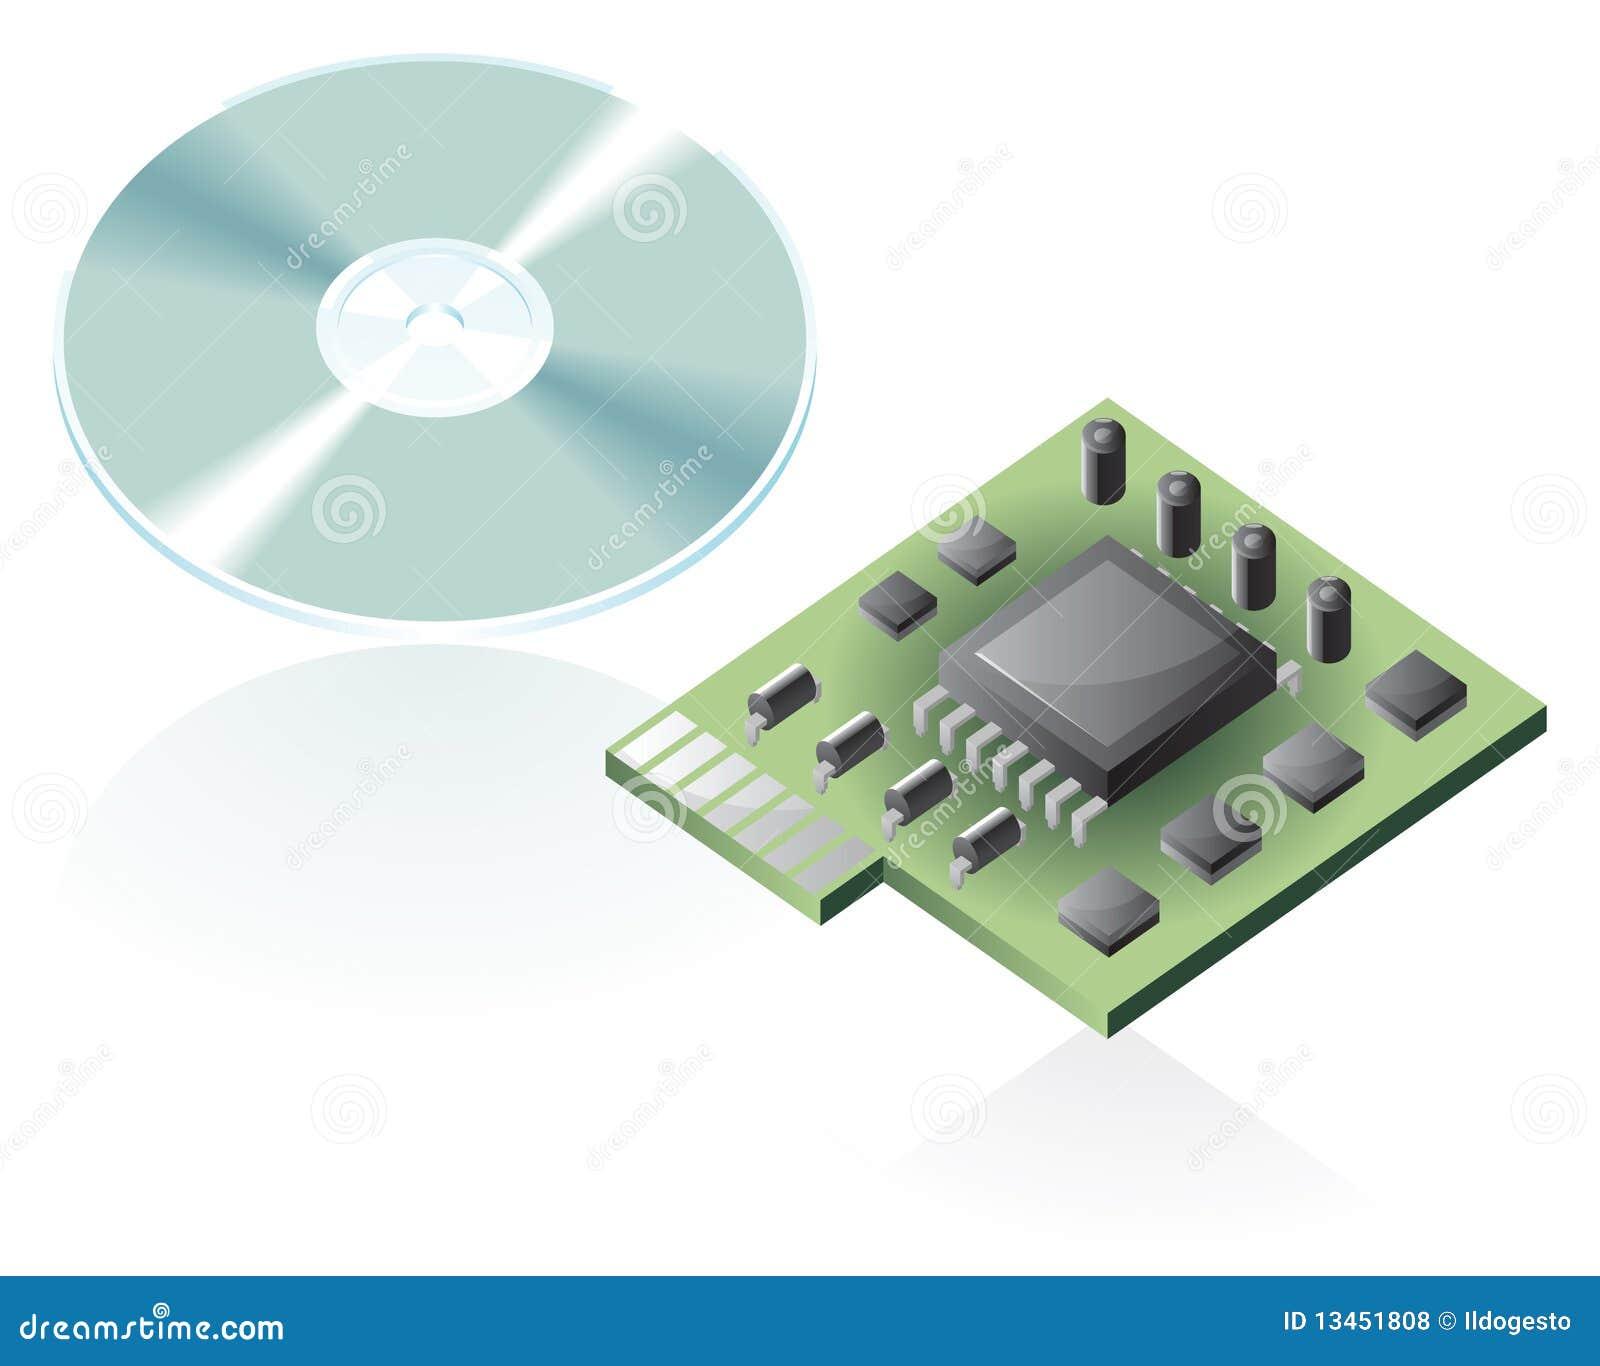 Parts Computer Clip Art Stock Photos, Images, & Pictures - 46 Images